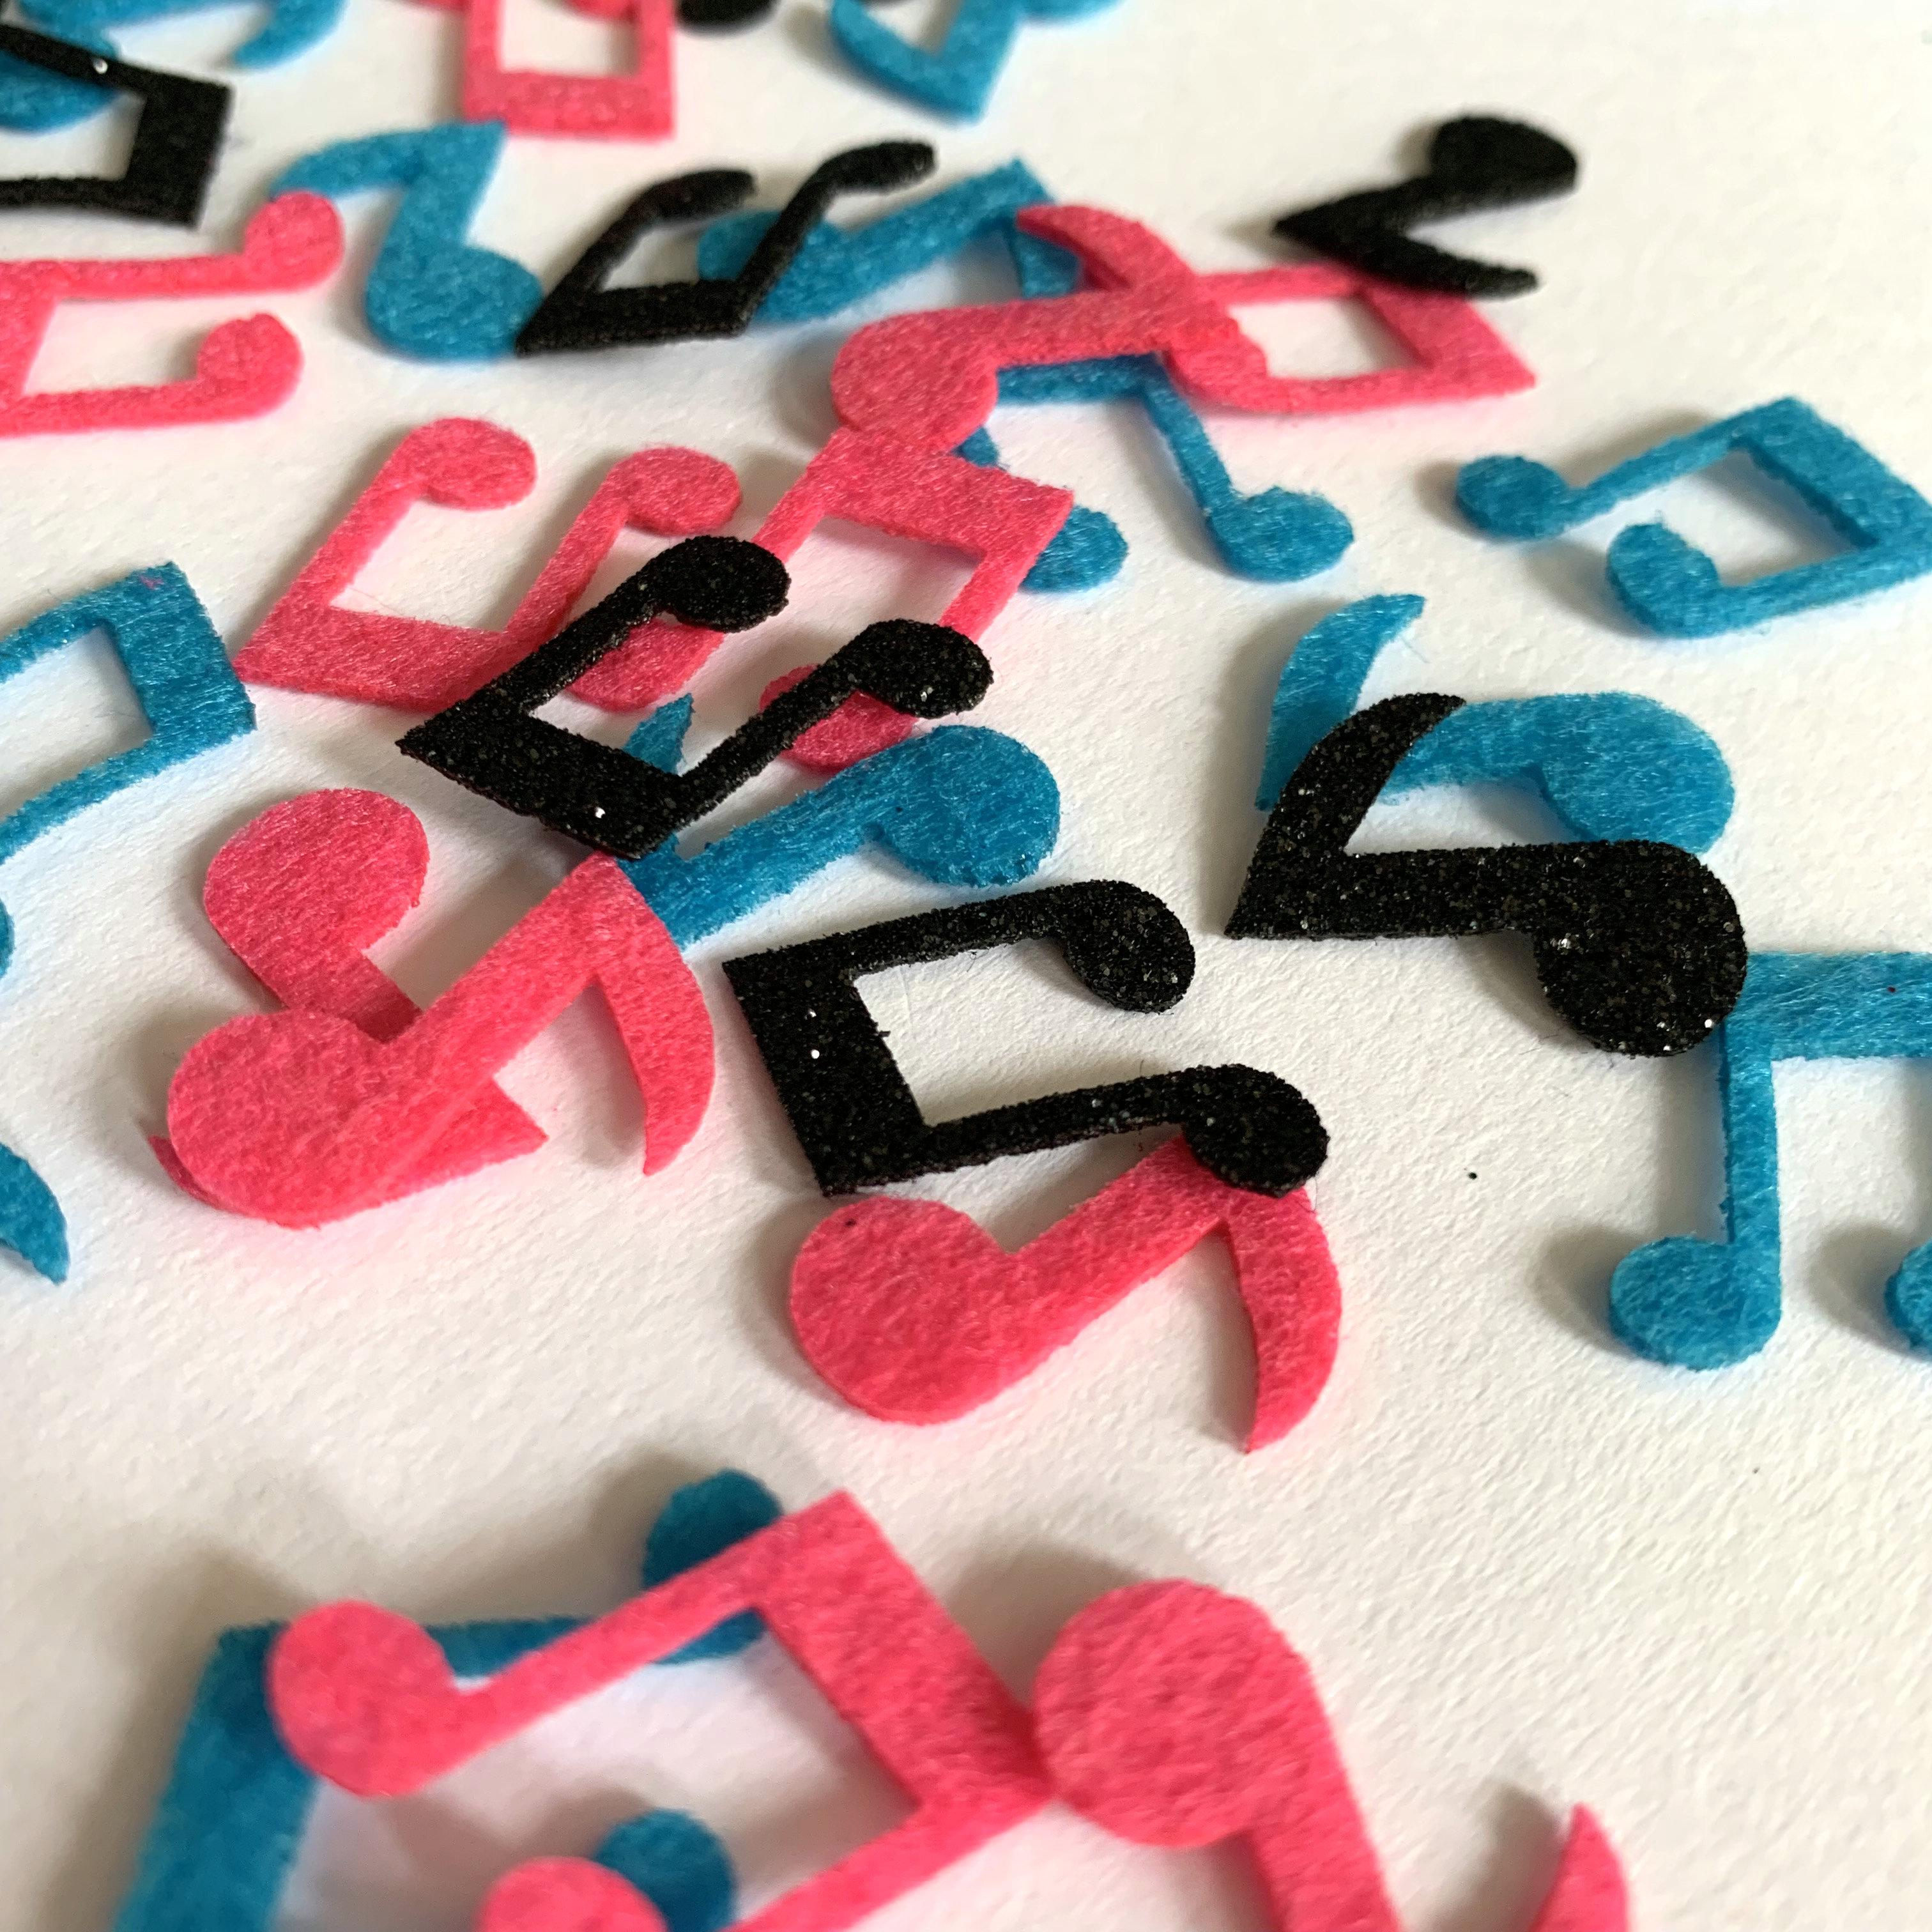 Nota musical confeti trébol Feliz cumpleaños Mesa Scatters decoraciones Glitter no tejido suministros de fiesta